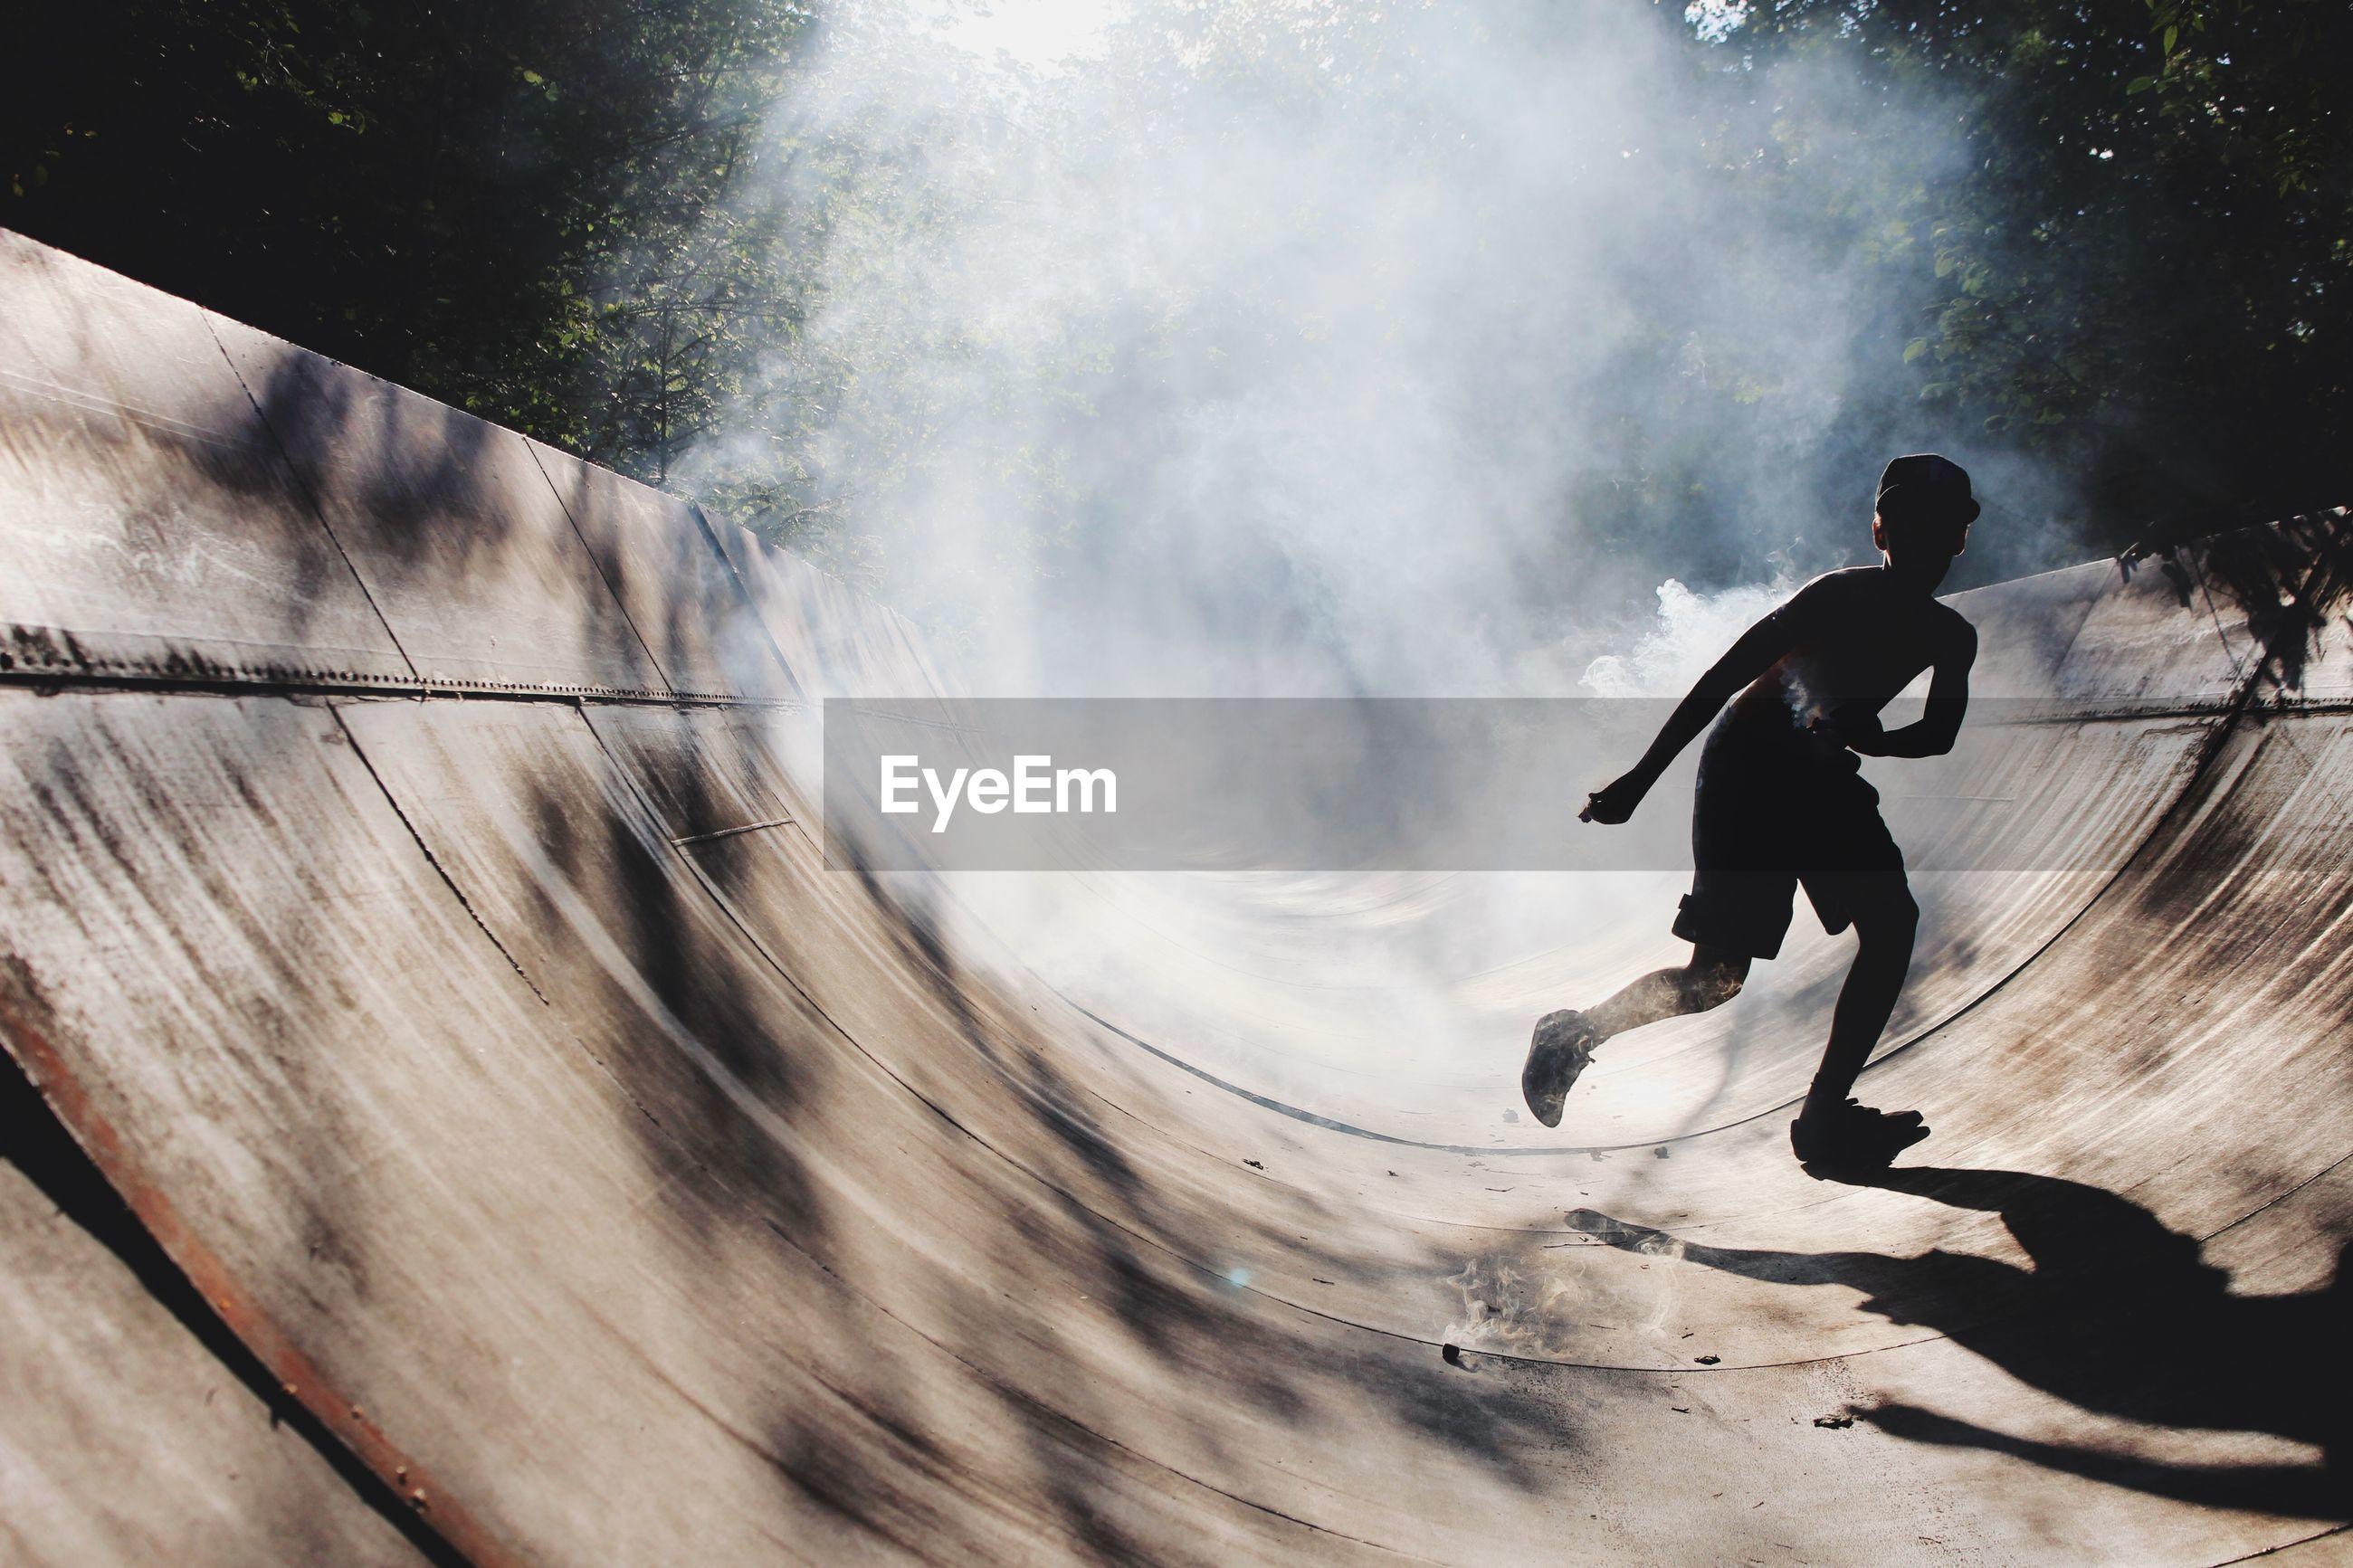 Teenage boy running on skateboard park during foggy weather